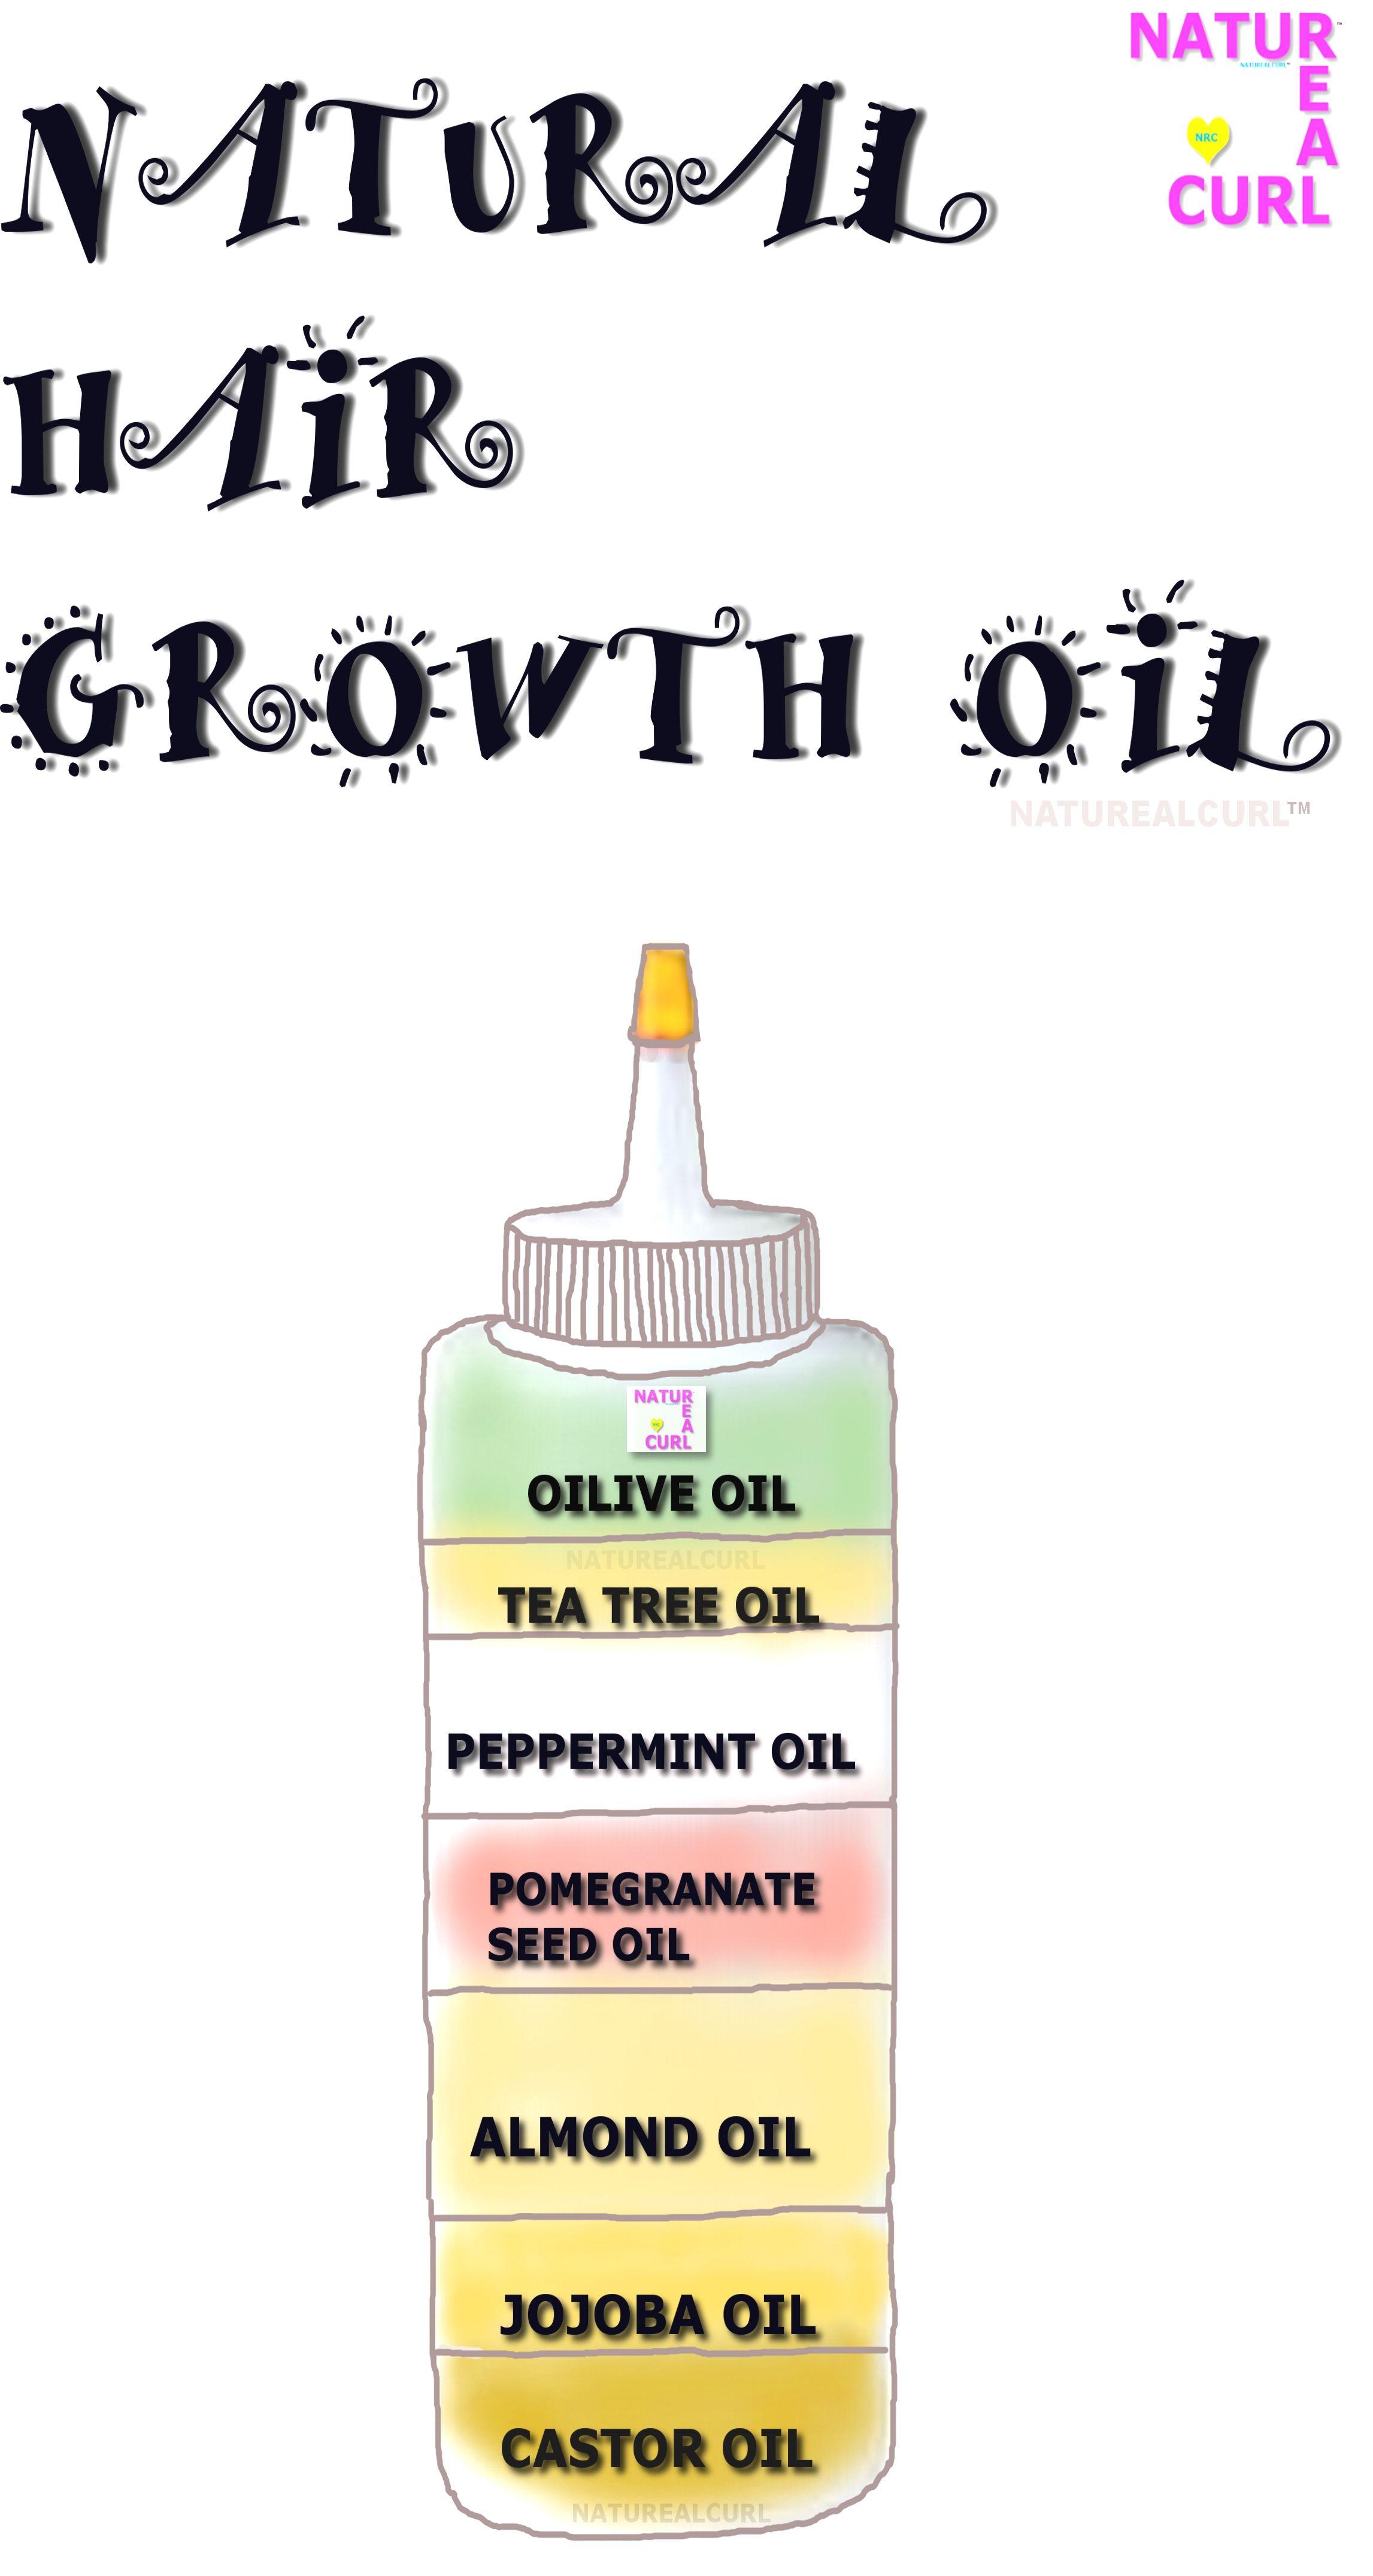 wild growth hair oil side effects Natural hair diy